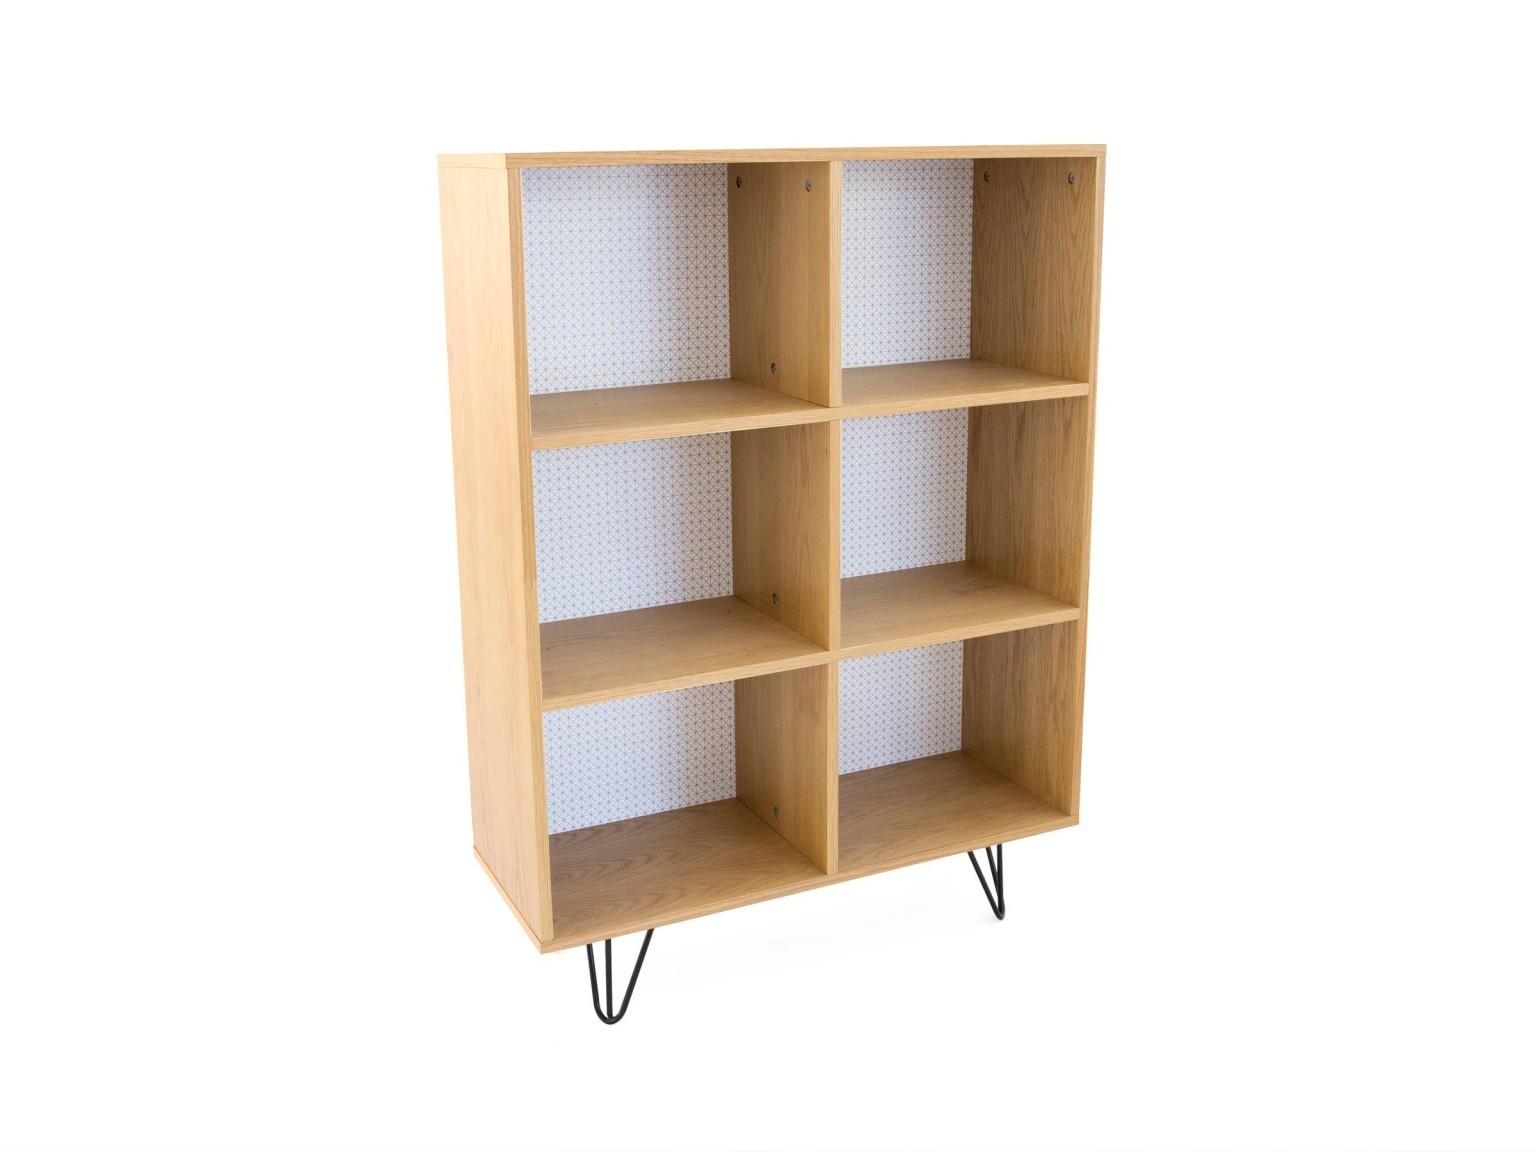 vibe-bookcase-b8-1536x1152